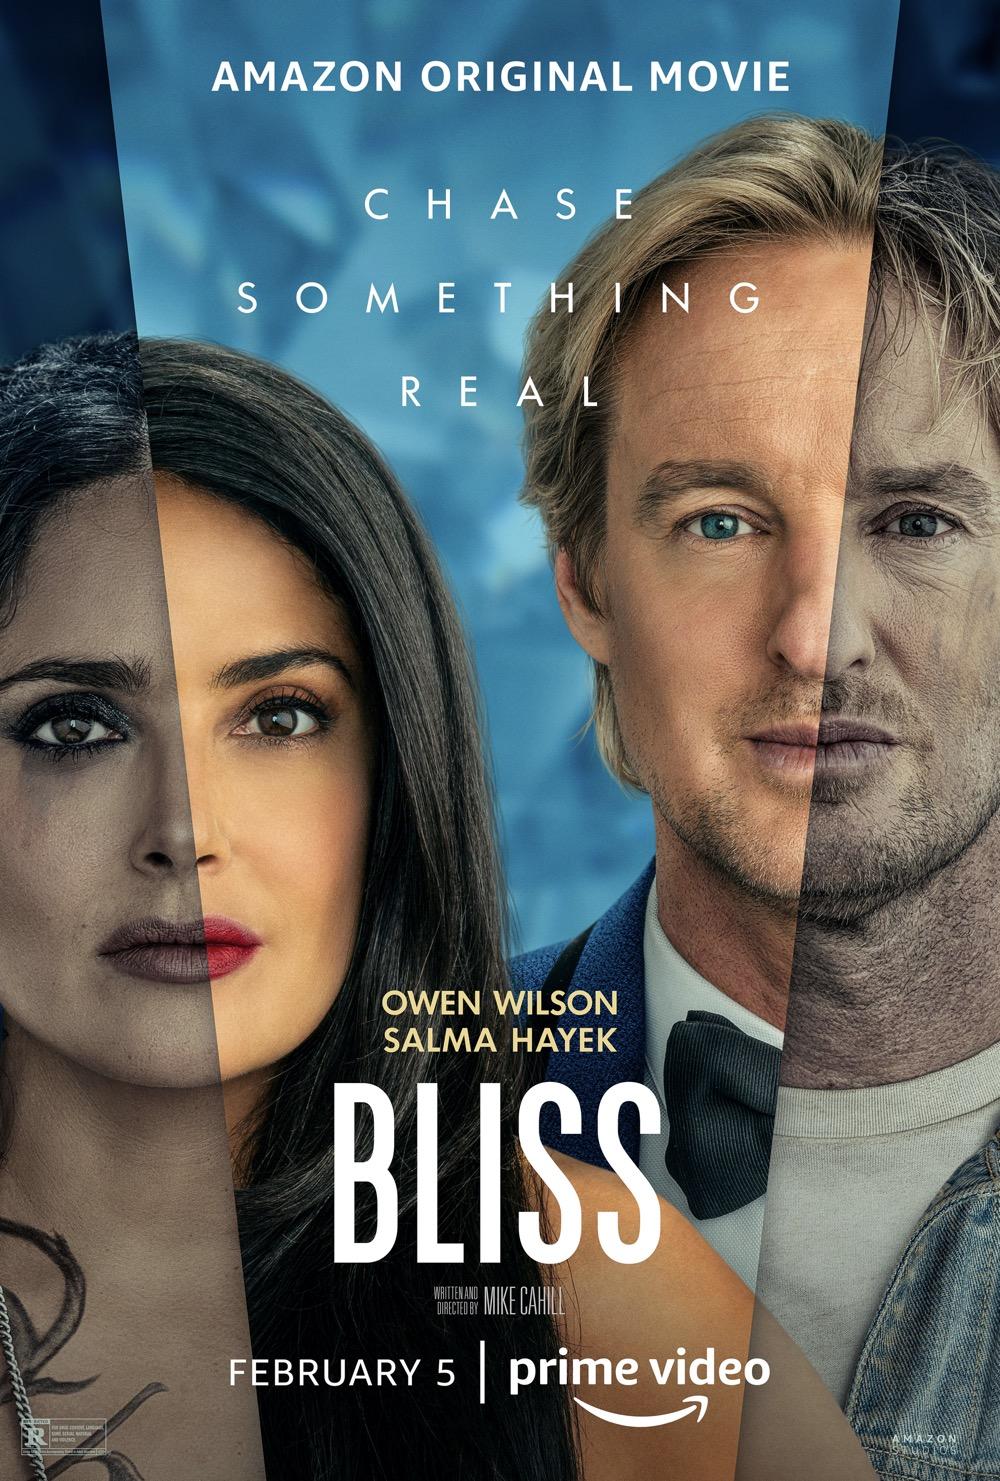 Bliss Movie Poster Owen Wilson Salma Hayek